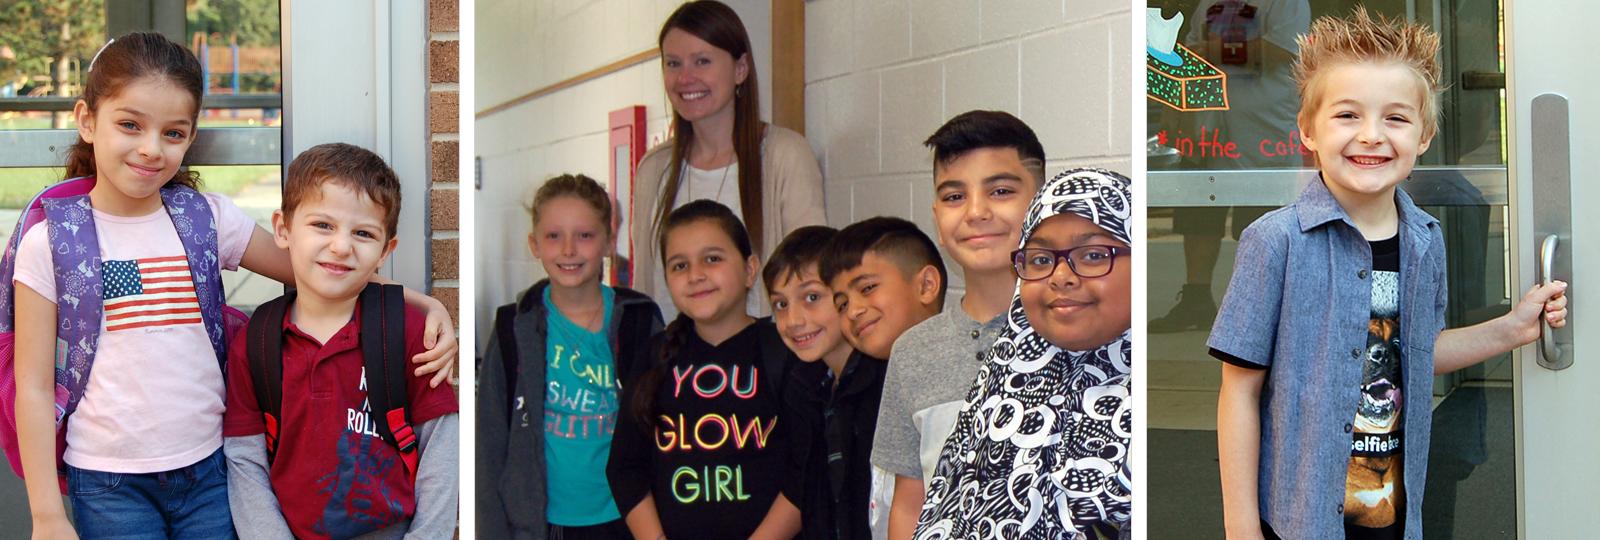 Harwood Elementary School